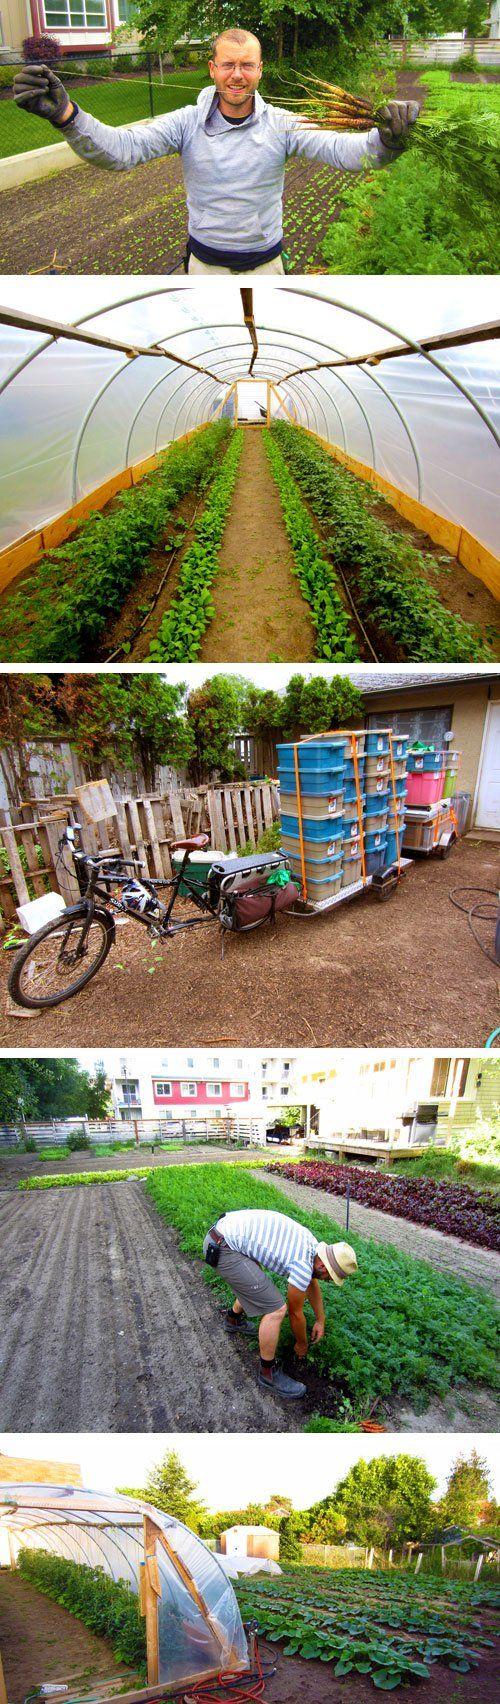 Pinterest the world s catalog of ideas - Profitable crops small plots ...